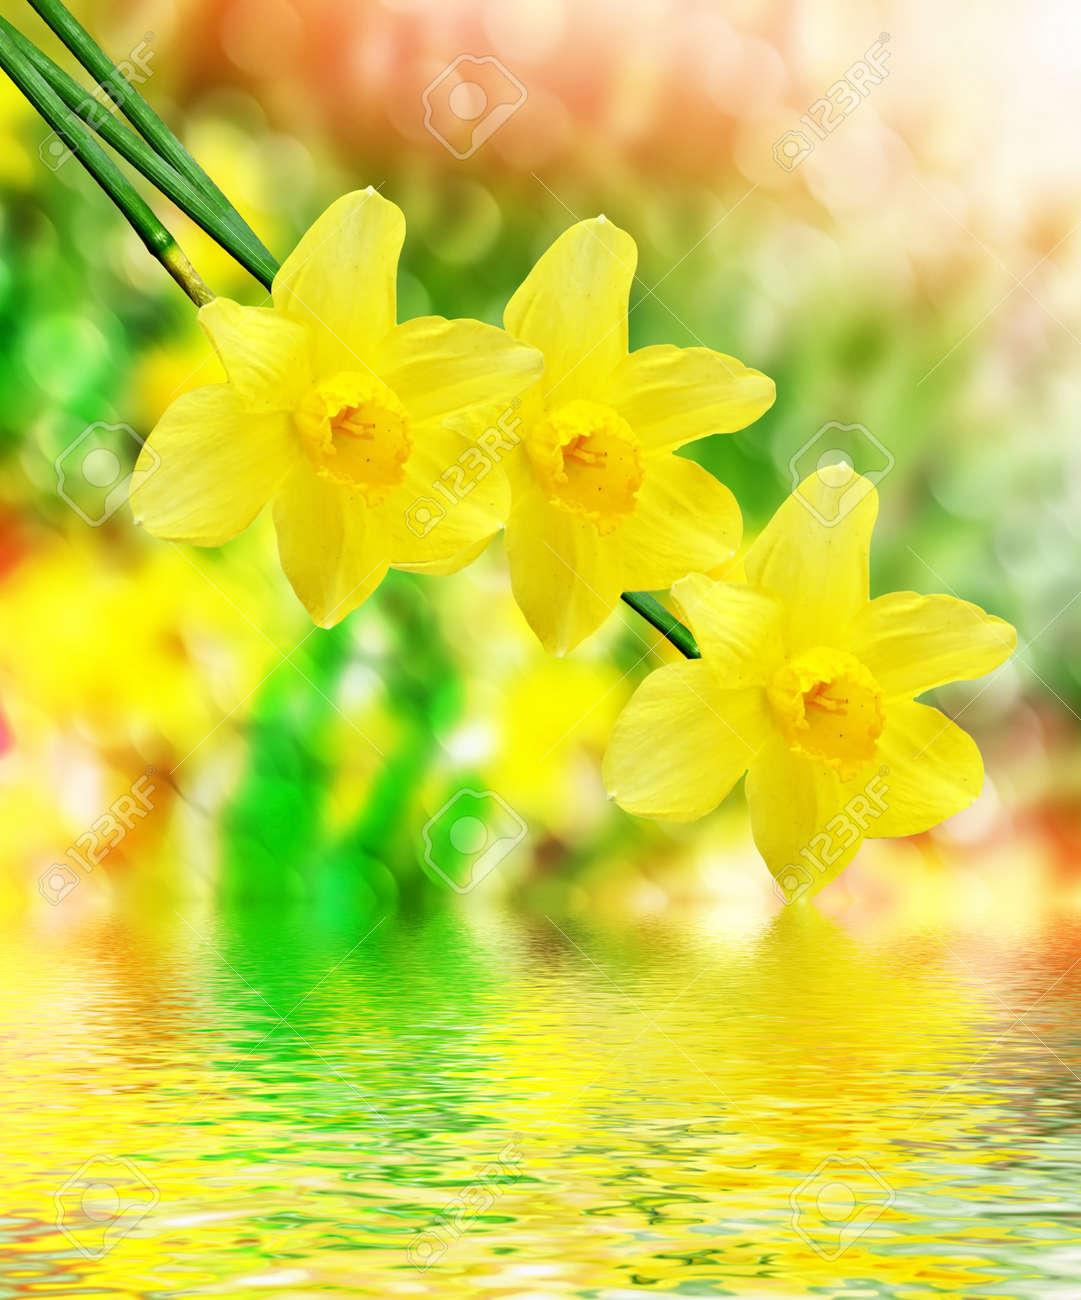 Spring landscape beautiful spring flowers daffodils yellow stock spring landscape beautiful spring flowers daffodils yellow flowers stock photo 57608253 mightylinksfo